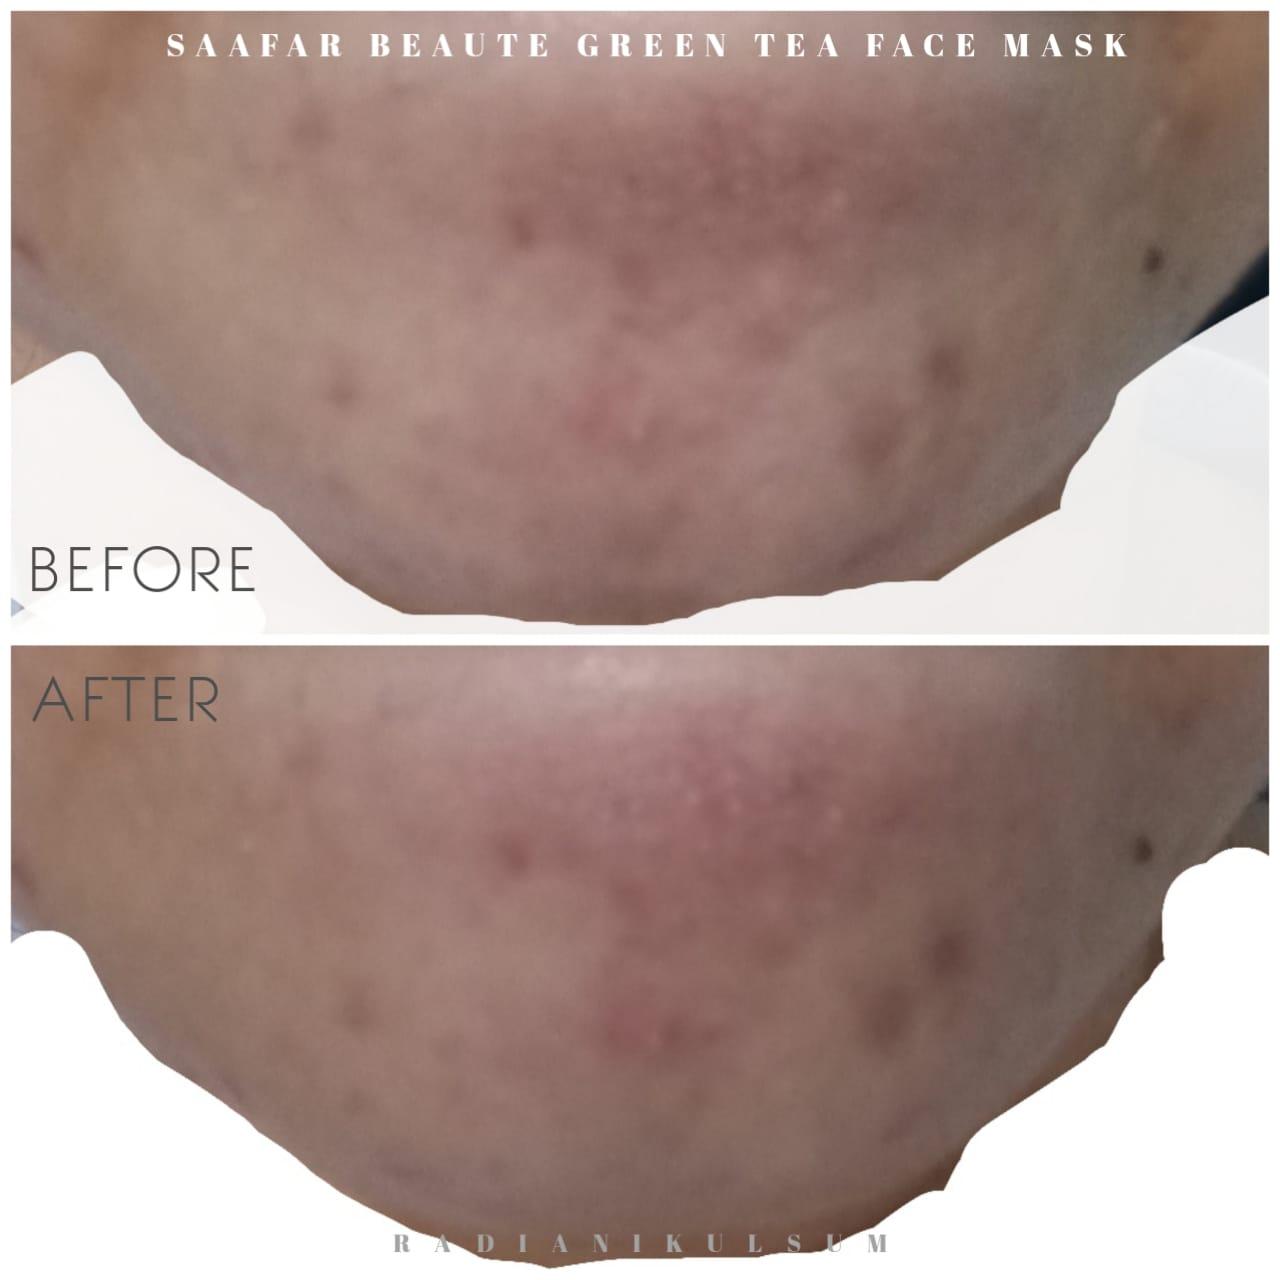 before-after pemakaian Saafar Beaute Green Tea Face Mask di dagu